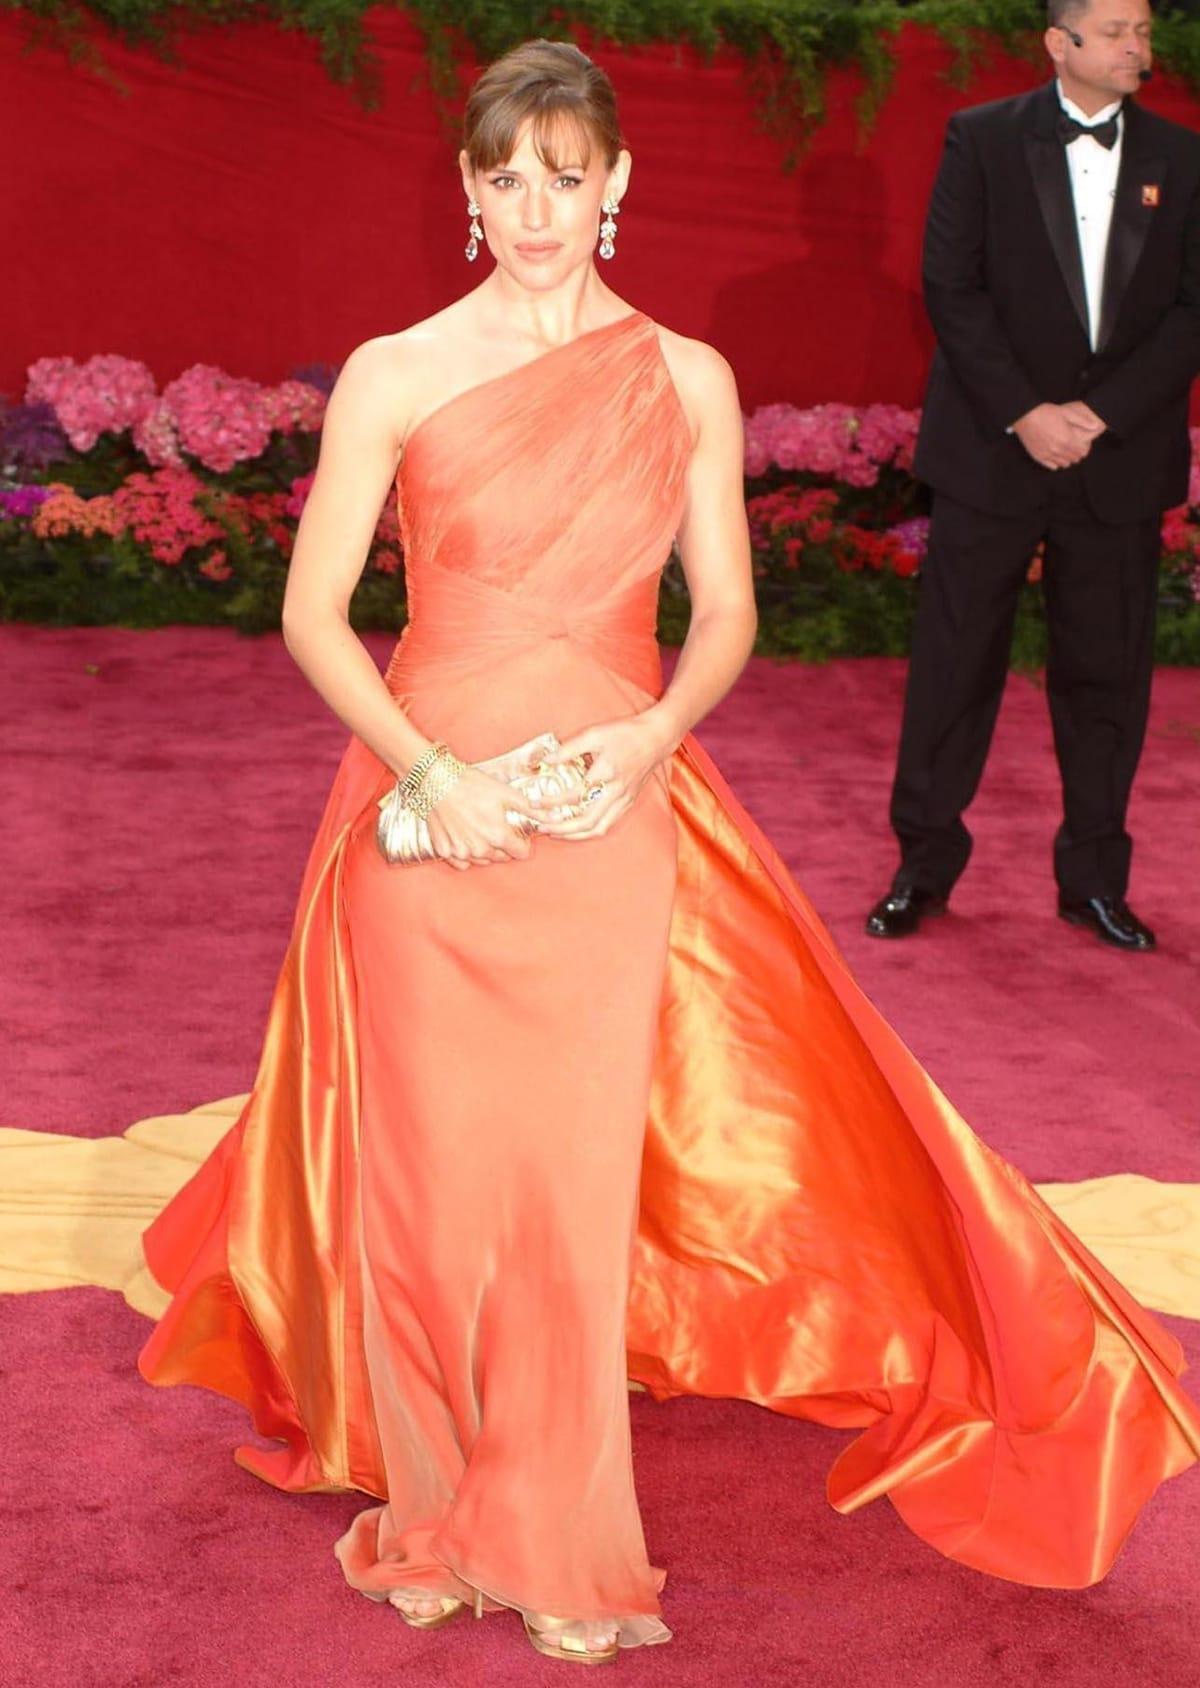 Jennifer Garner in an orange asymmetrical Valentino dress at the 2004 Oscars